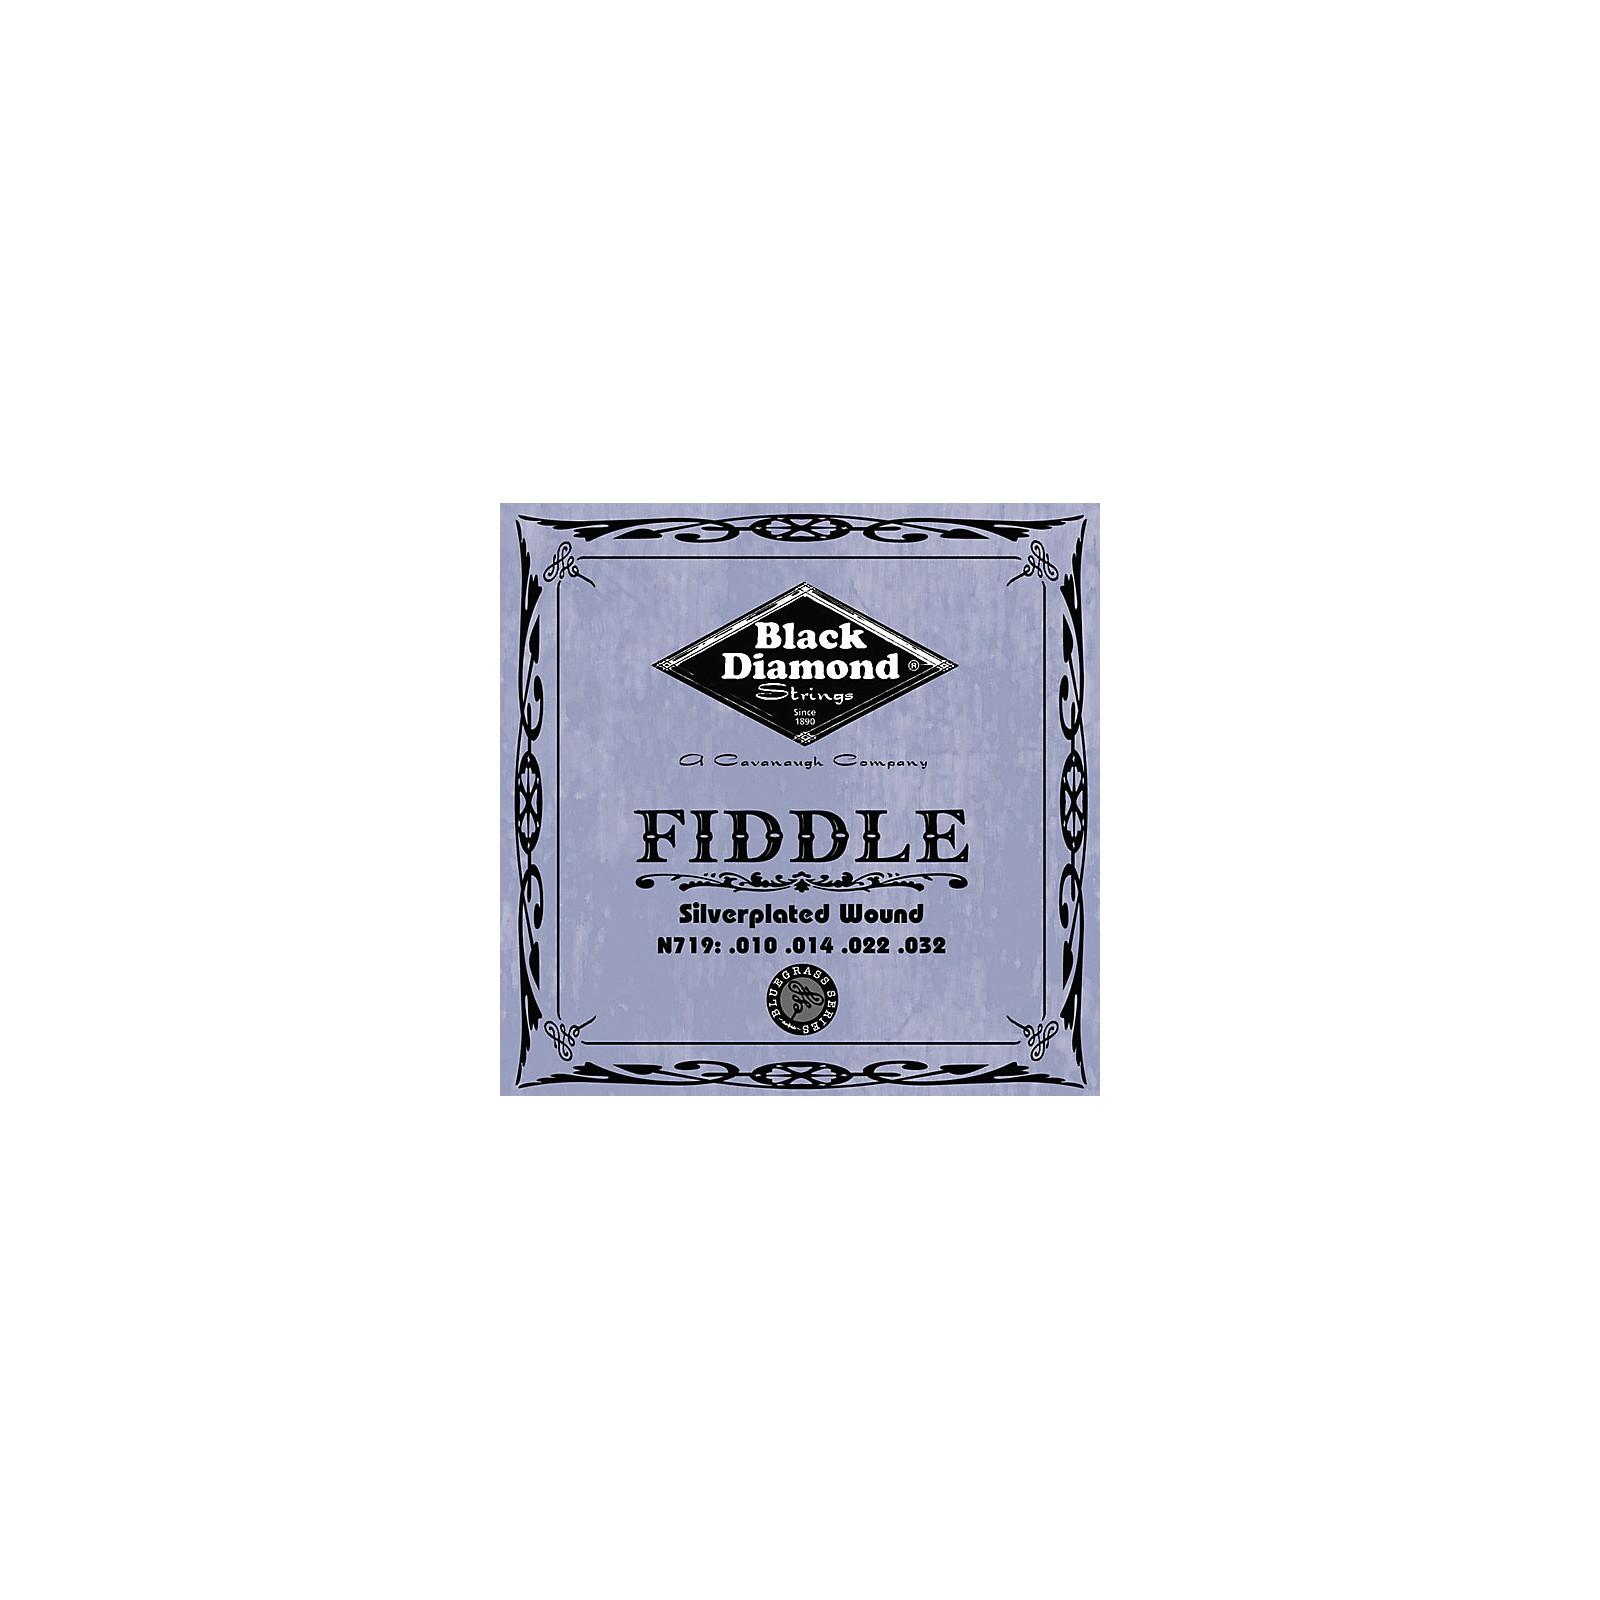 Black Diamond Silver-Plated Fiddle Strings